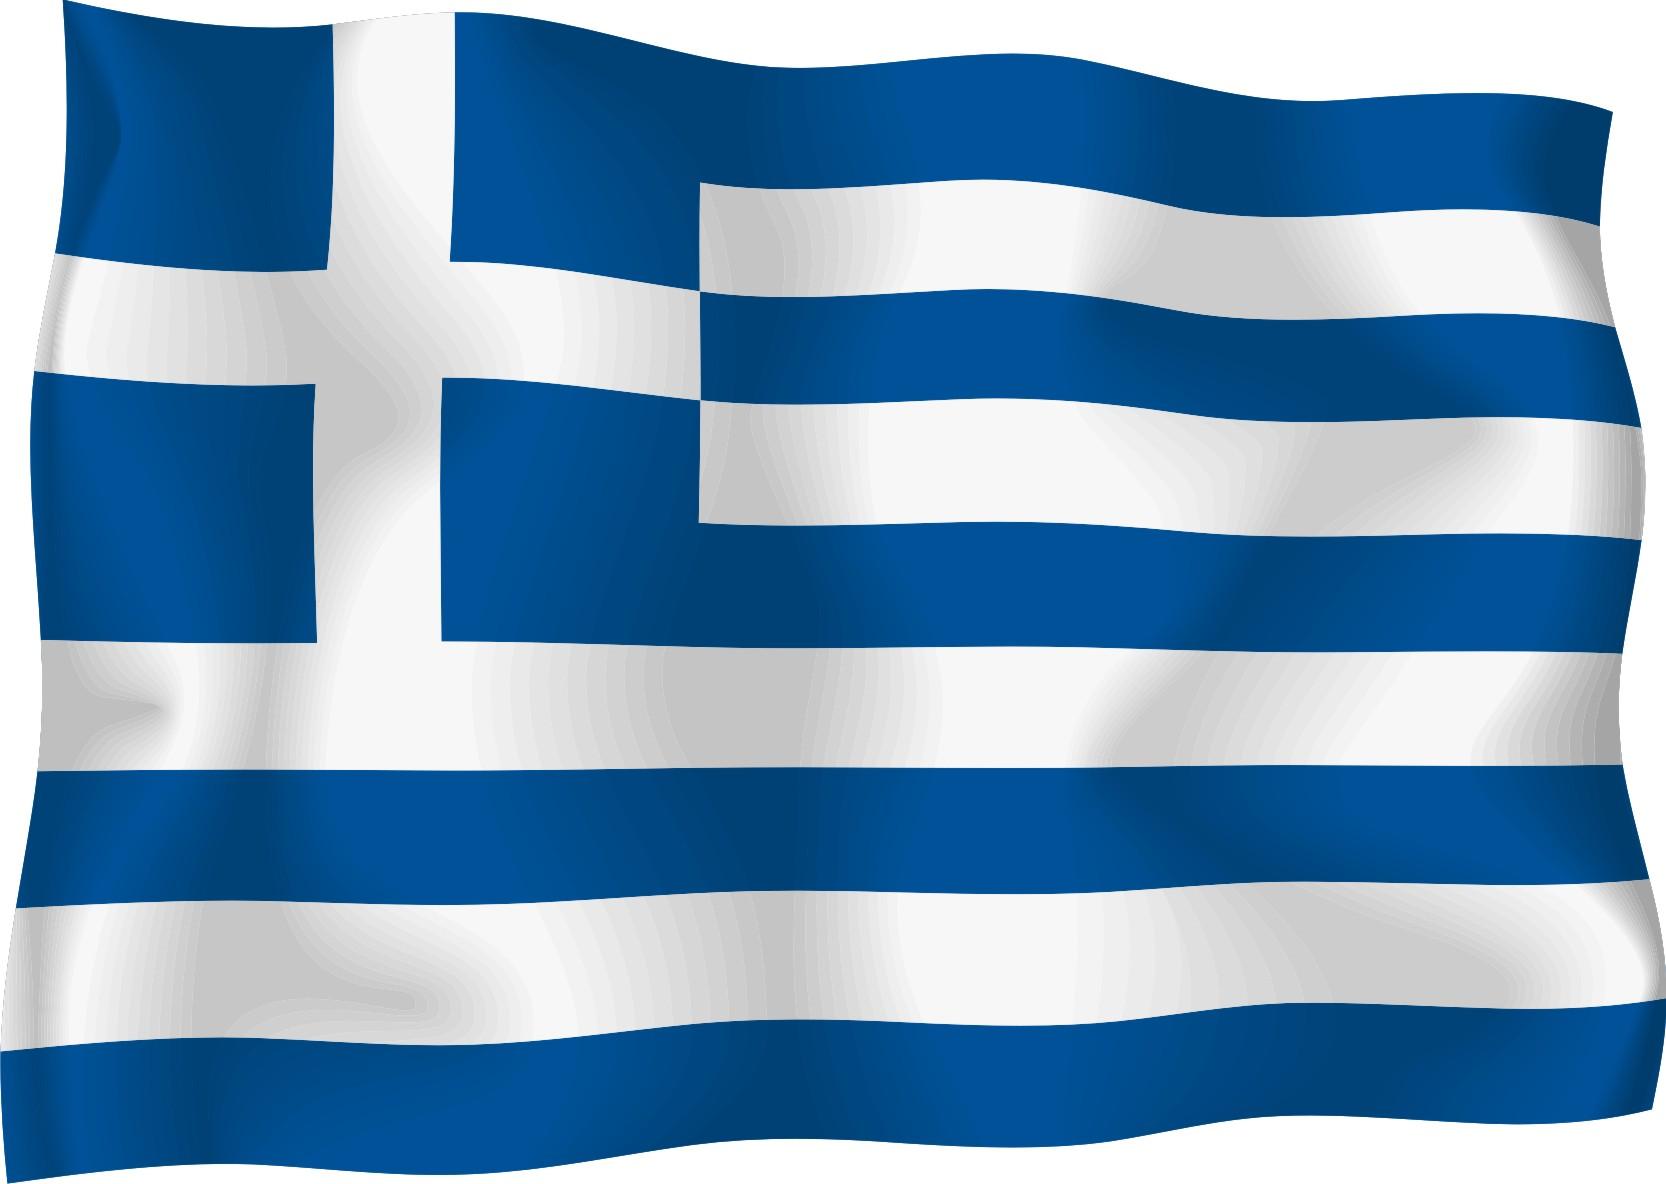 Greek Flag Clipart   ClipArt Best   ClipArt Best   ClipArt Best